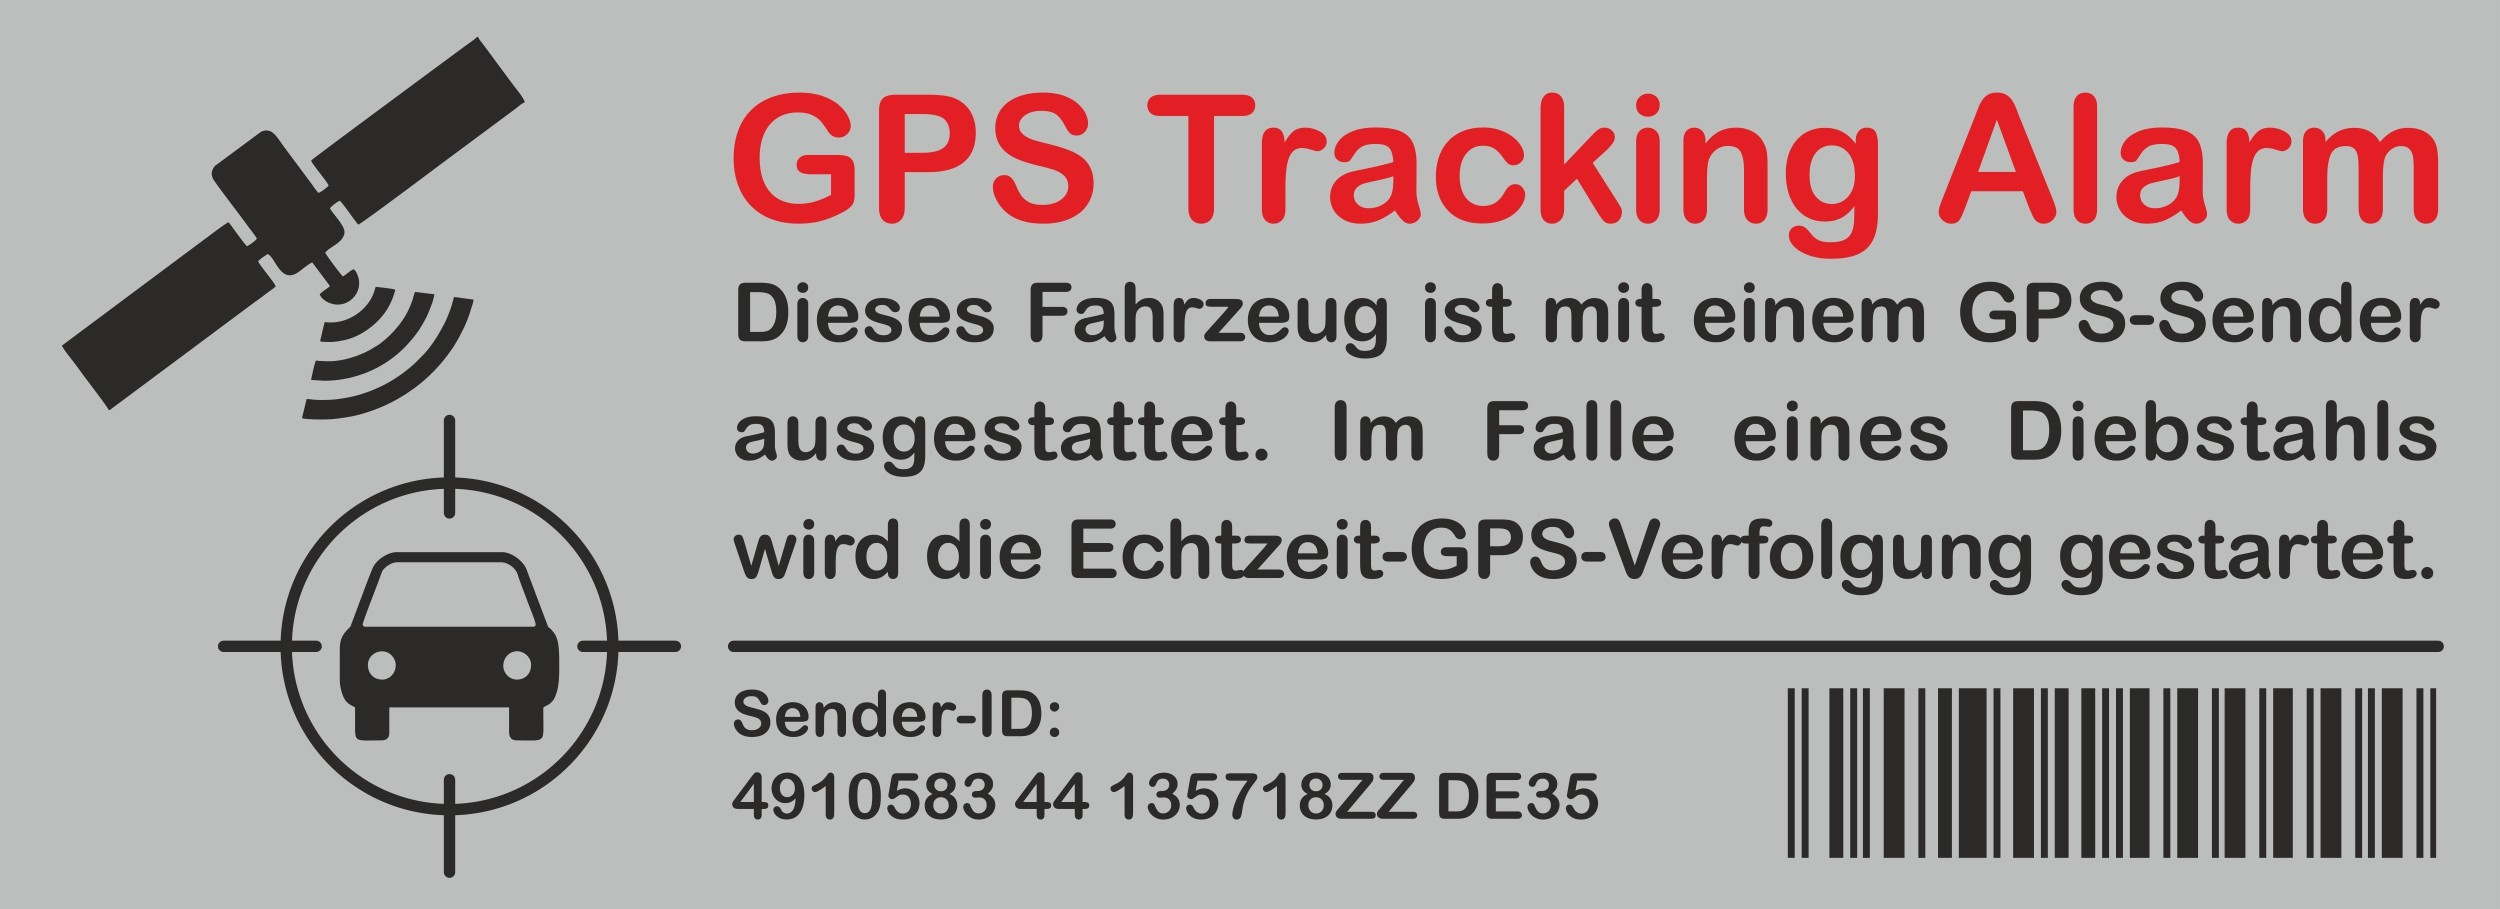 Sticker GPS Tracking Alarm 120 x 40 mm – Bild 1